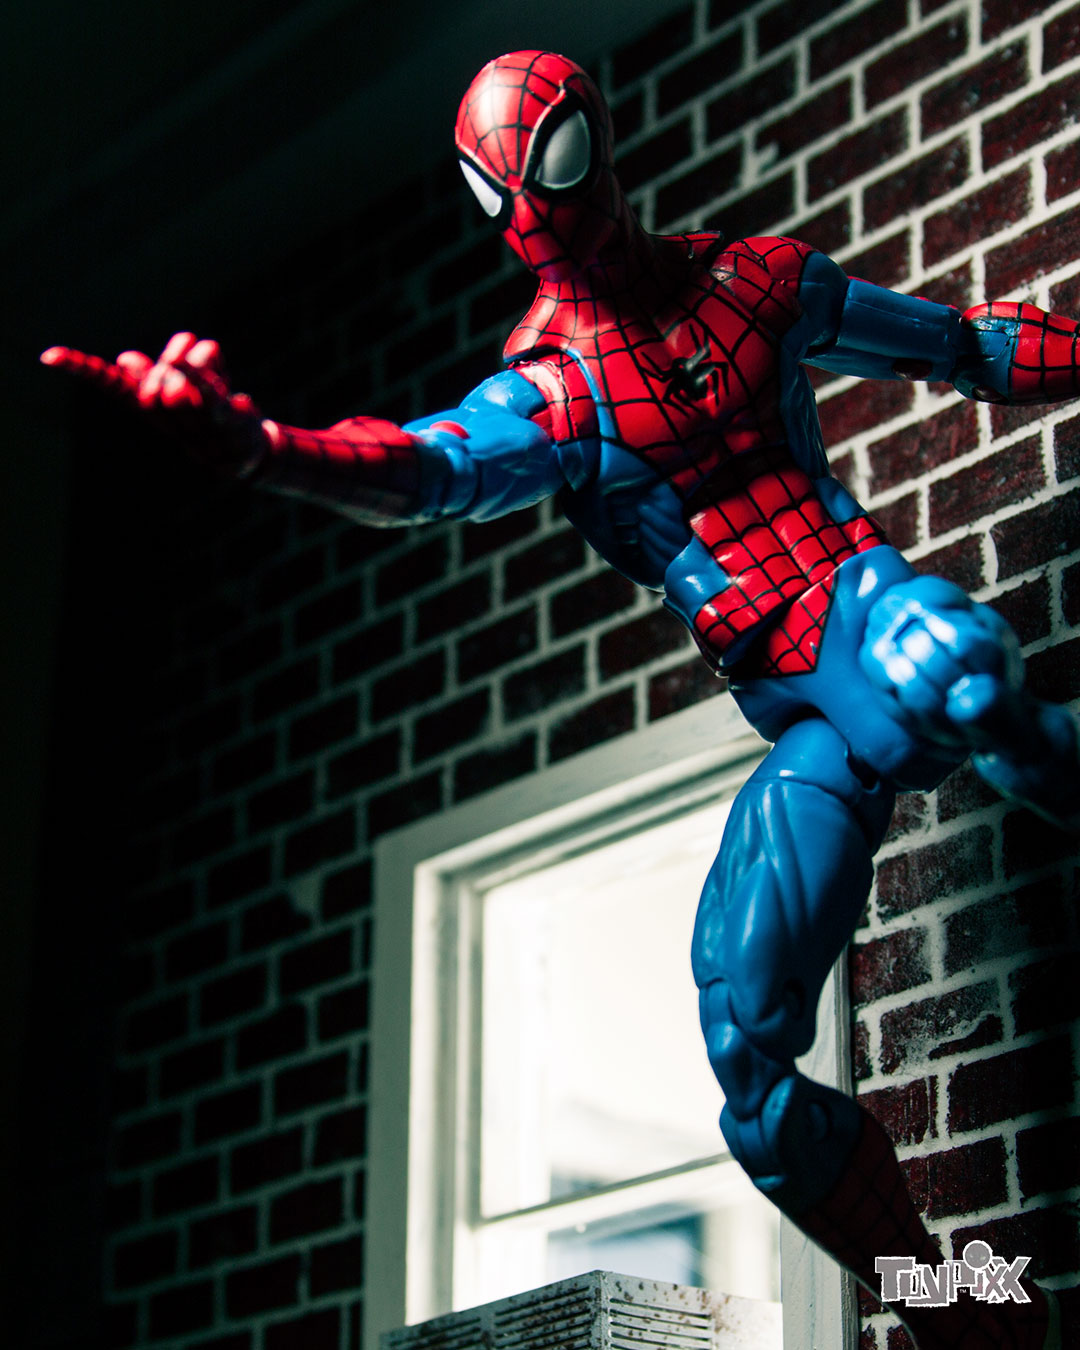 Toypixx Marvel Legends Spider-Man Toy Photography